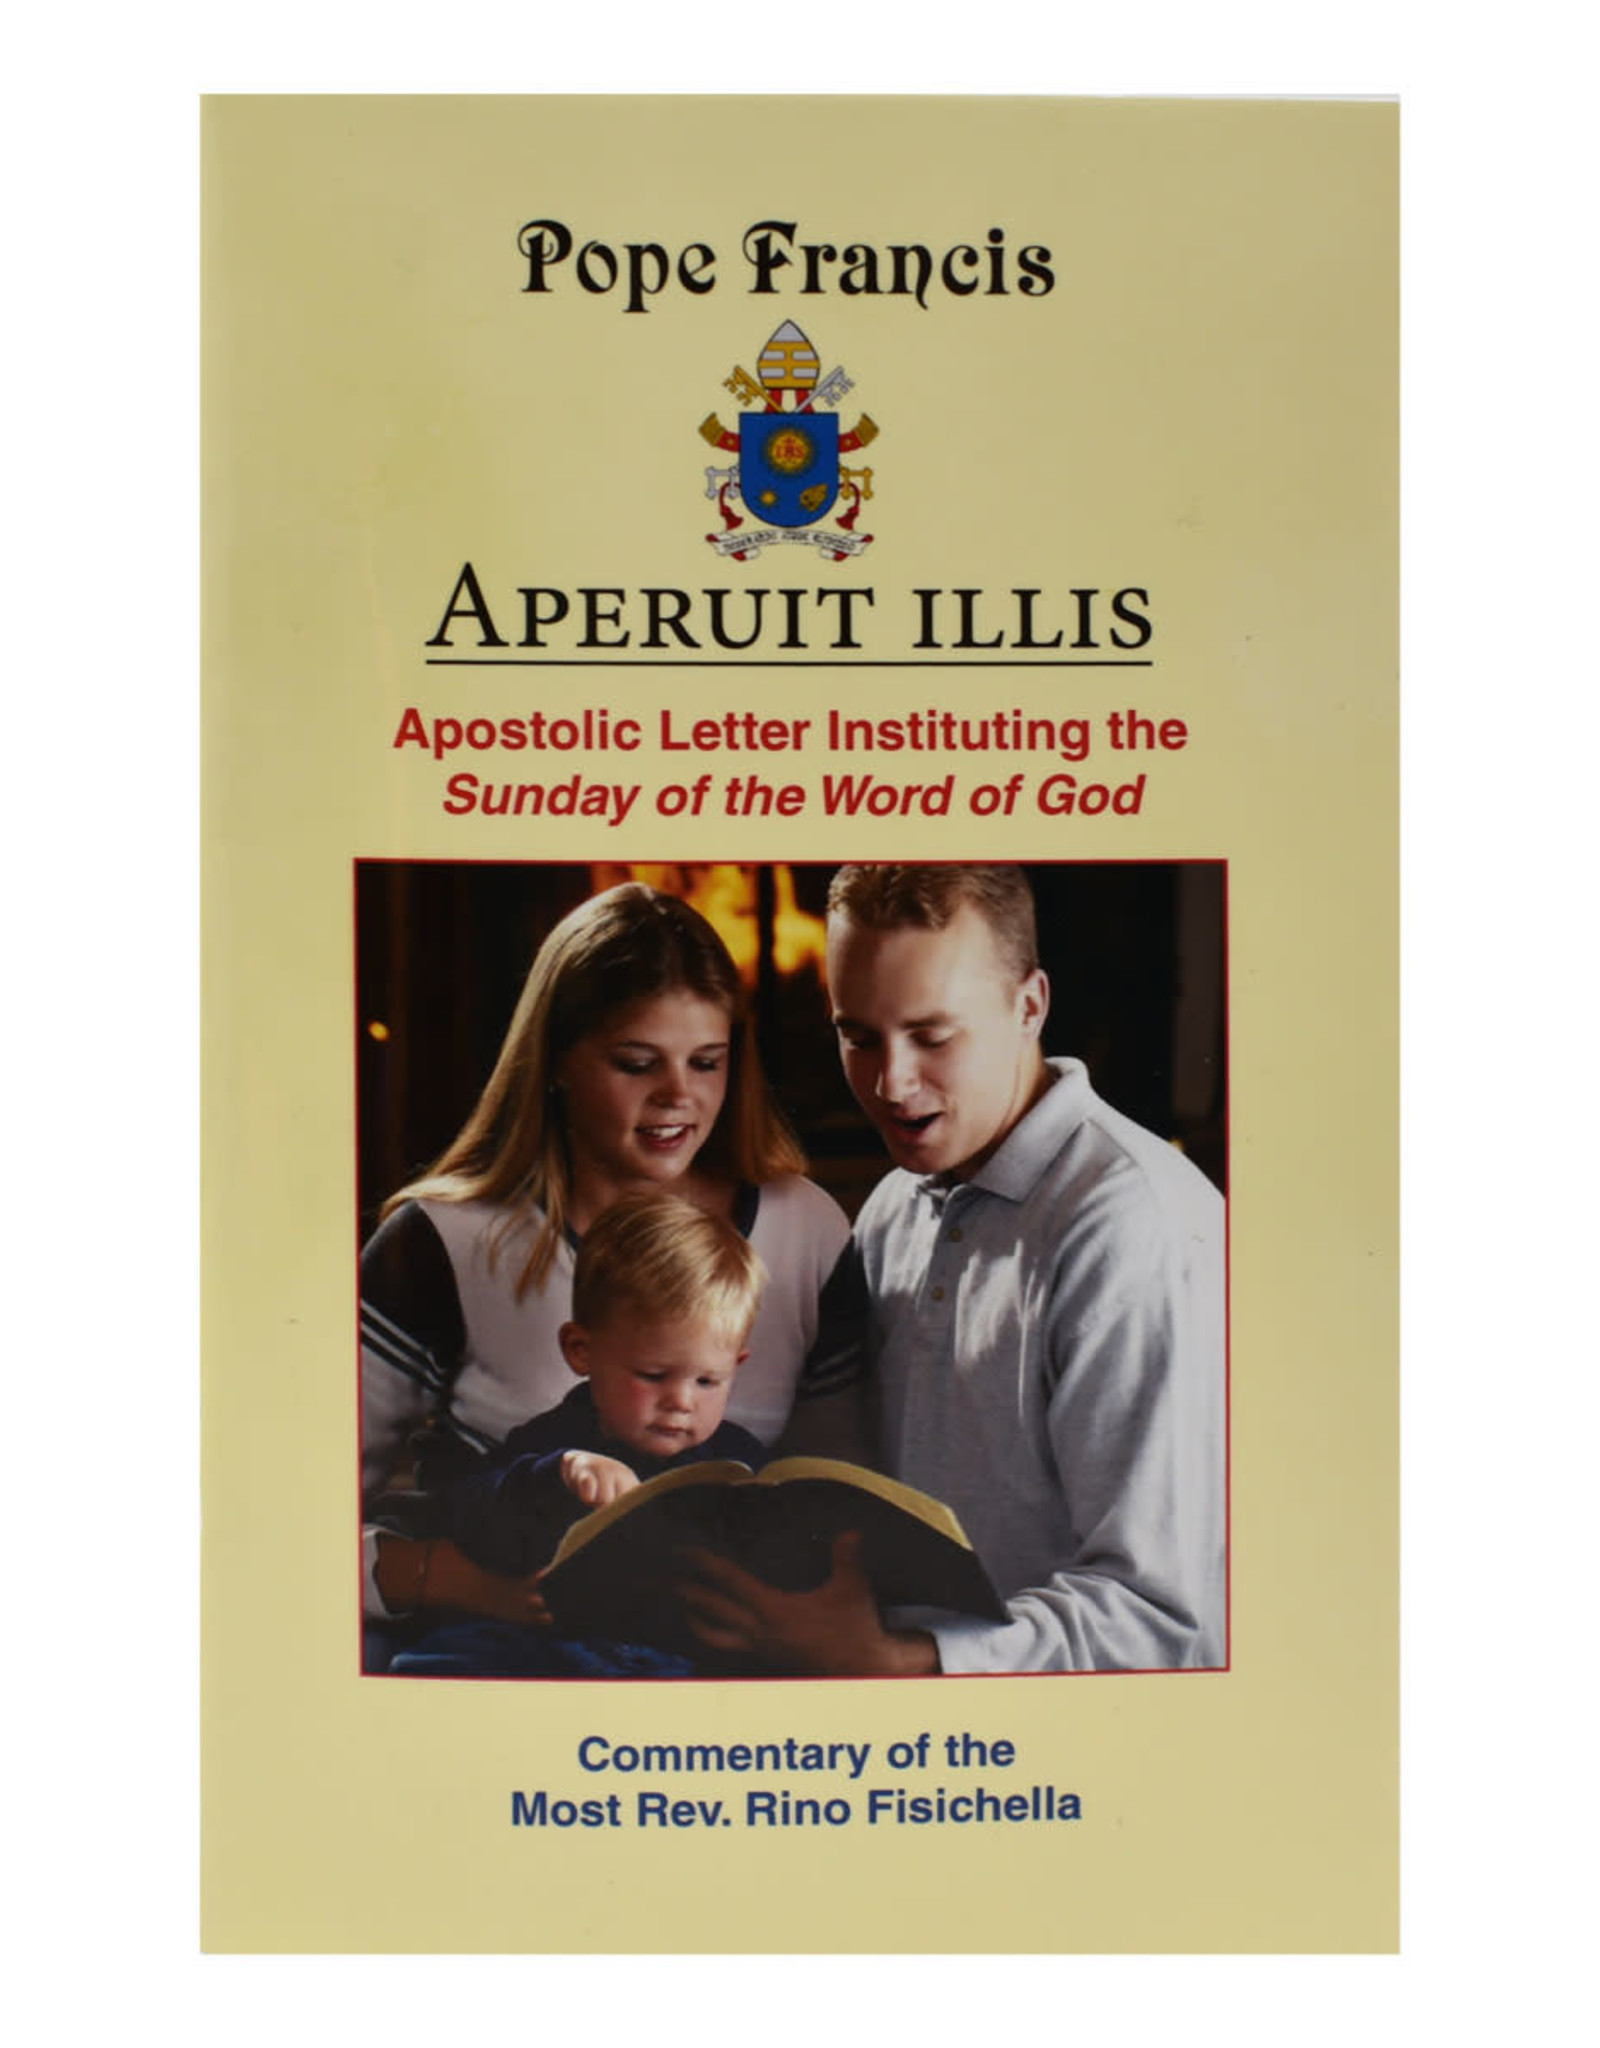 Aperuit illis: Apostolic Letter Instituting The Sunday Of The Word Of God